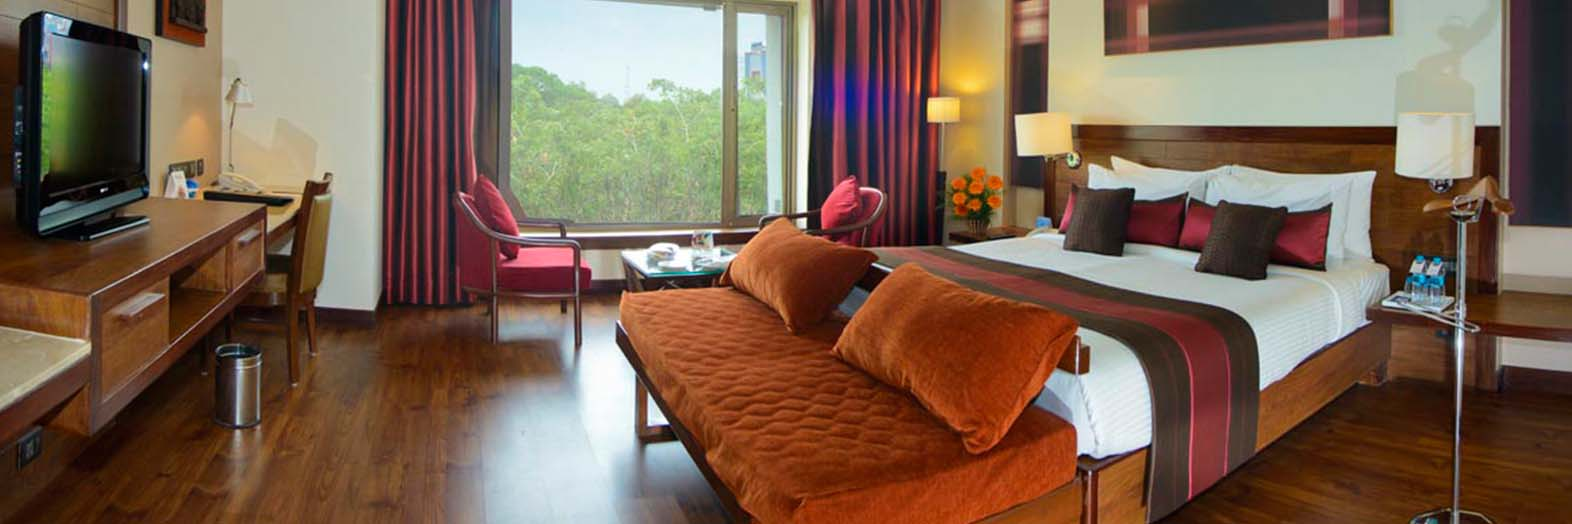 Fortune Pandiyan Hotel – Hotels in Madurai Room